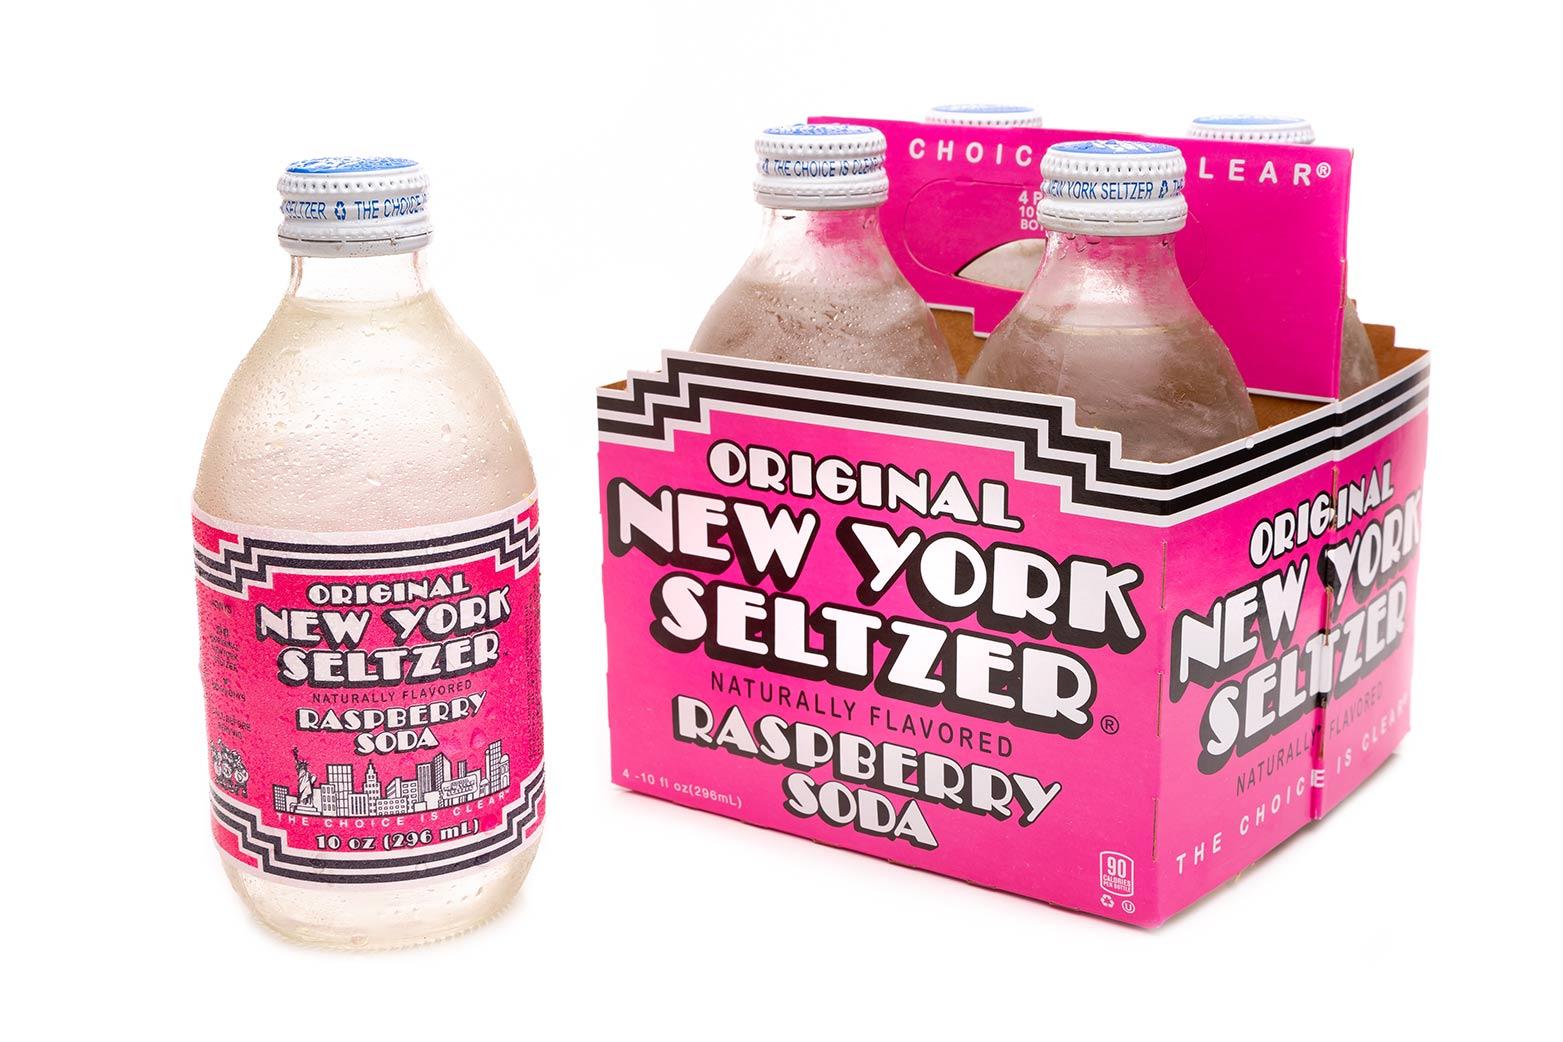 Original New York Seltzer Raspberry 4-pack carrier with bottle